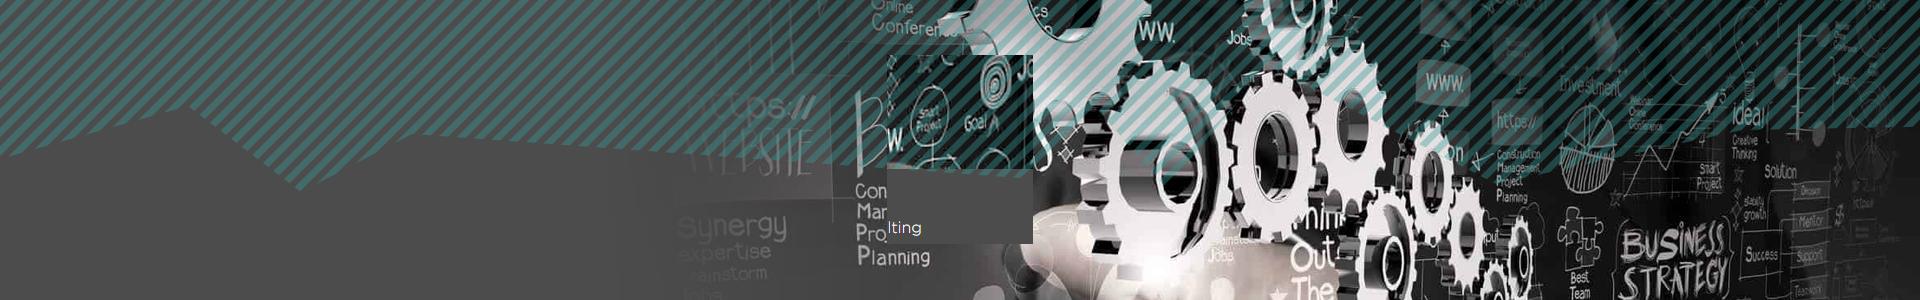 Schmietex GmbH: Consulting